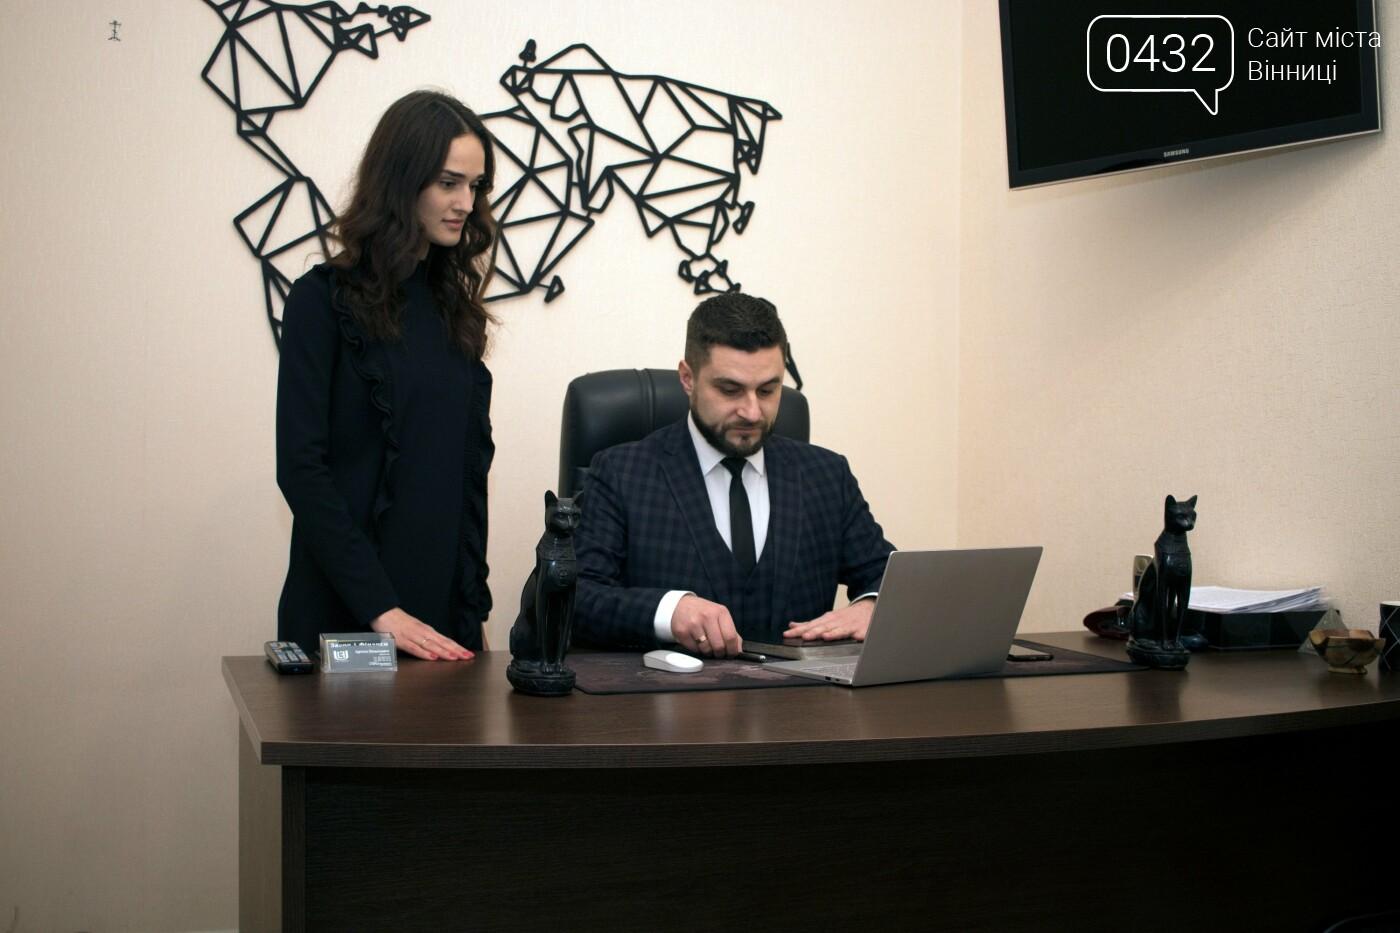 Как адвокаты избавили клиента от долгов: адвокат по кредитам Винница, фото-8